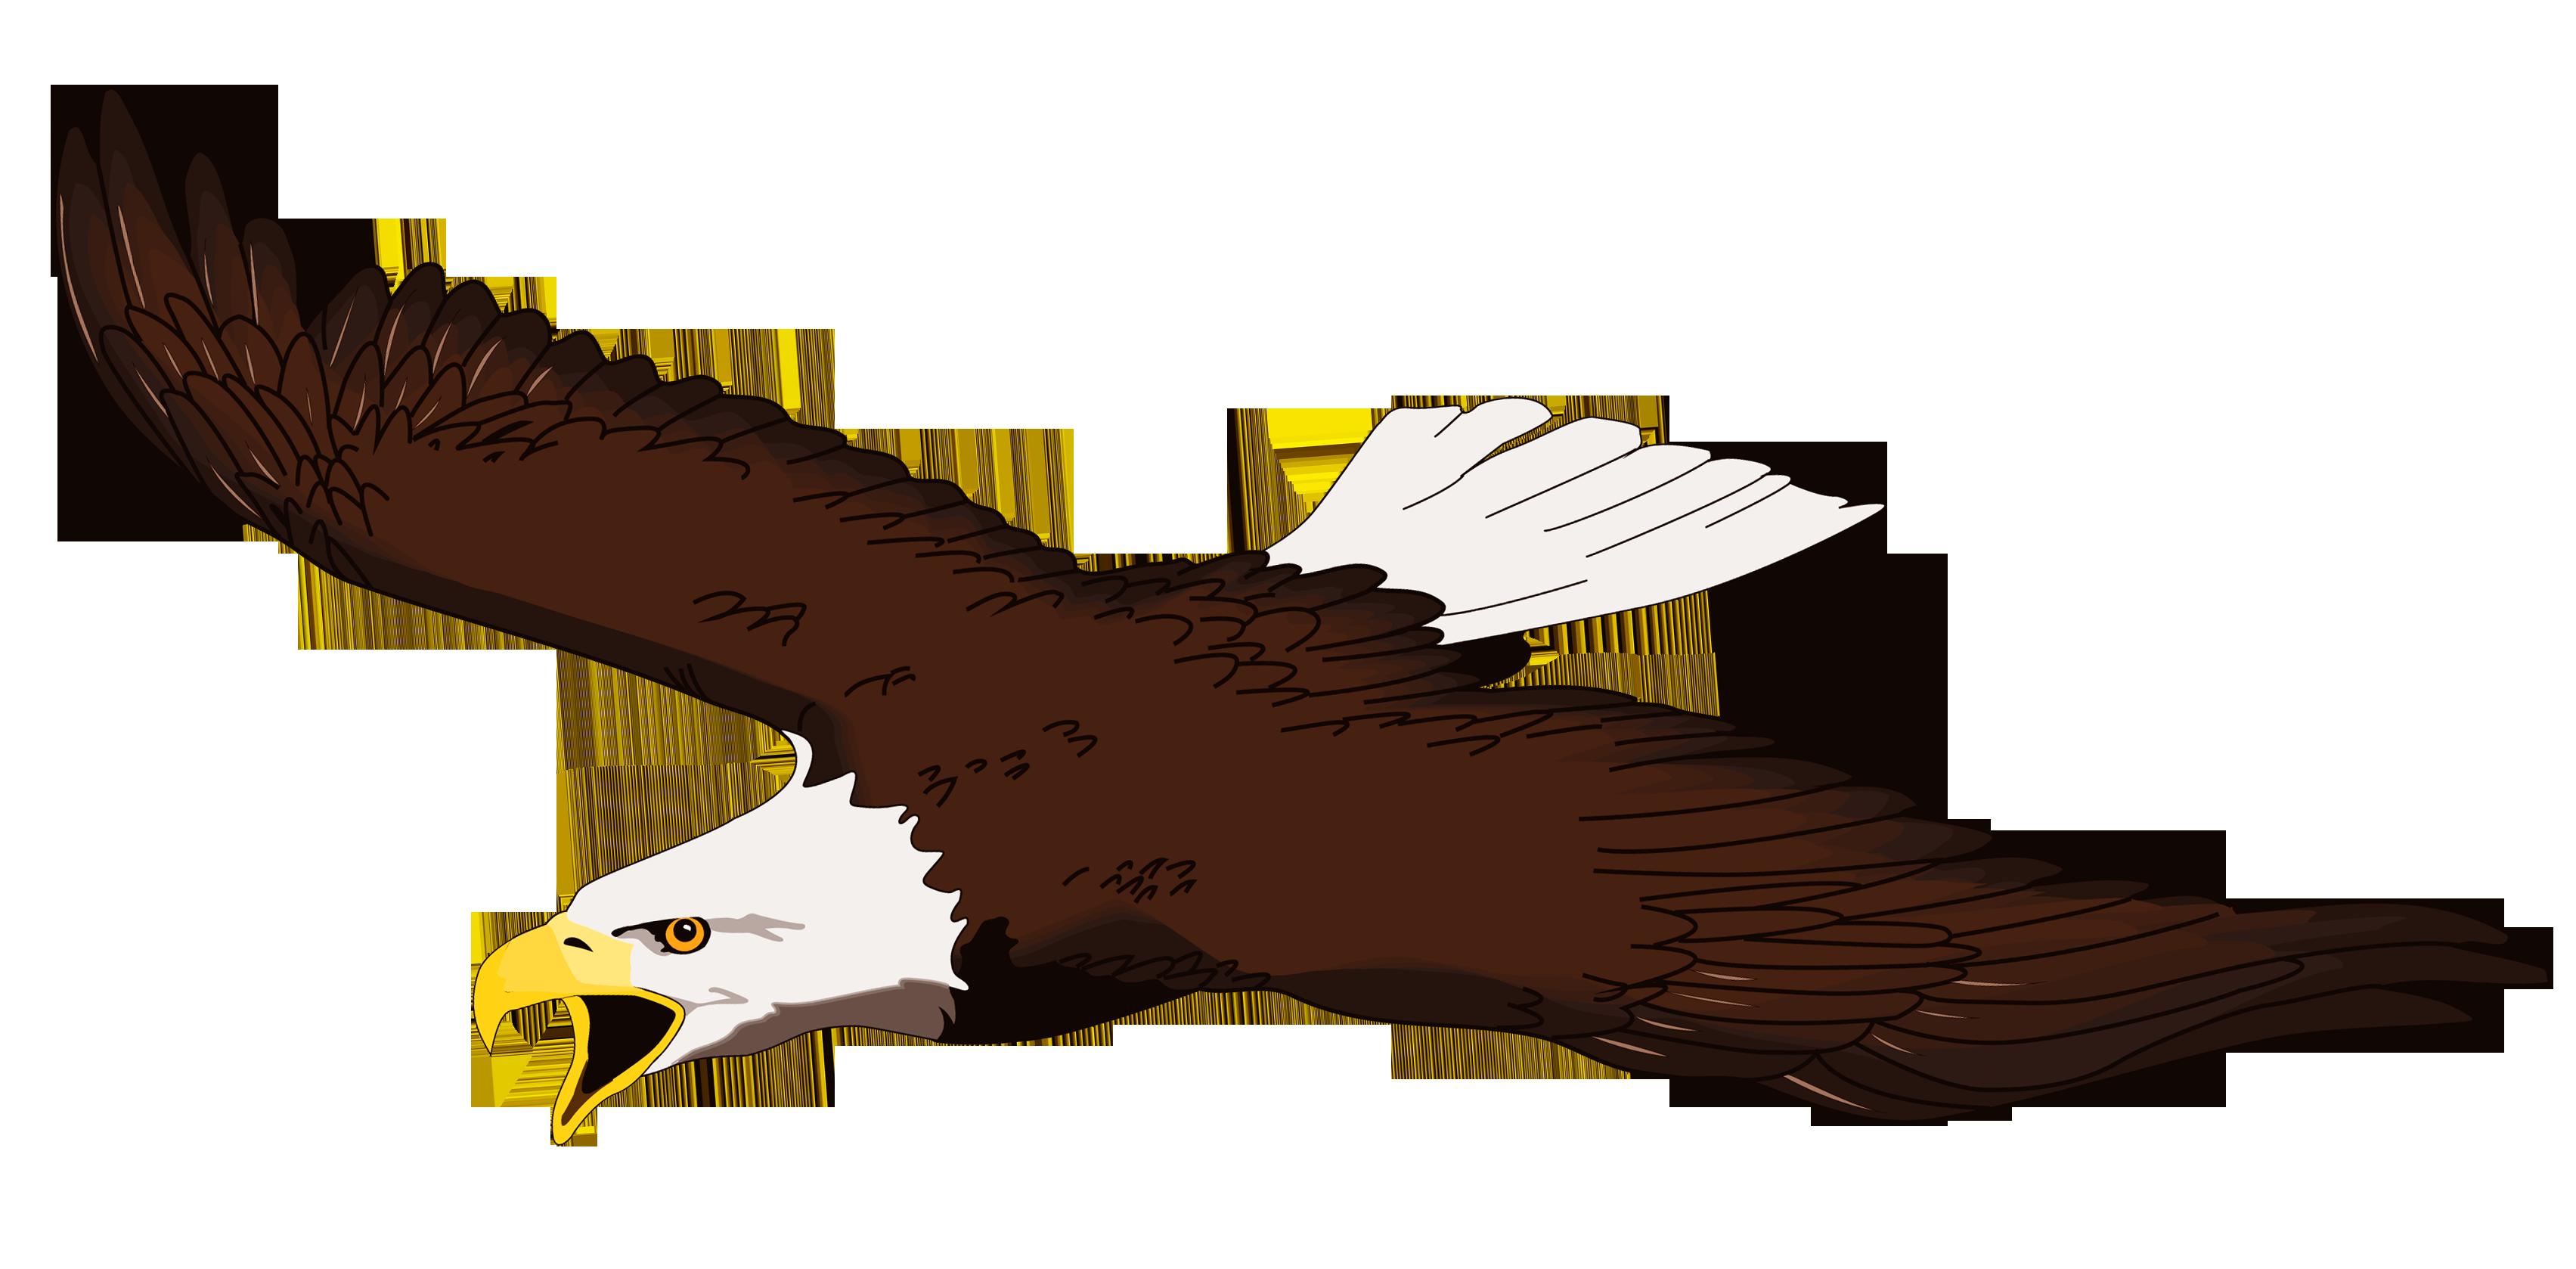 Eagle Clipart Free Clipart-Eagle clipart free clipart-7